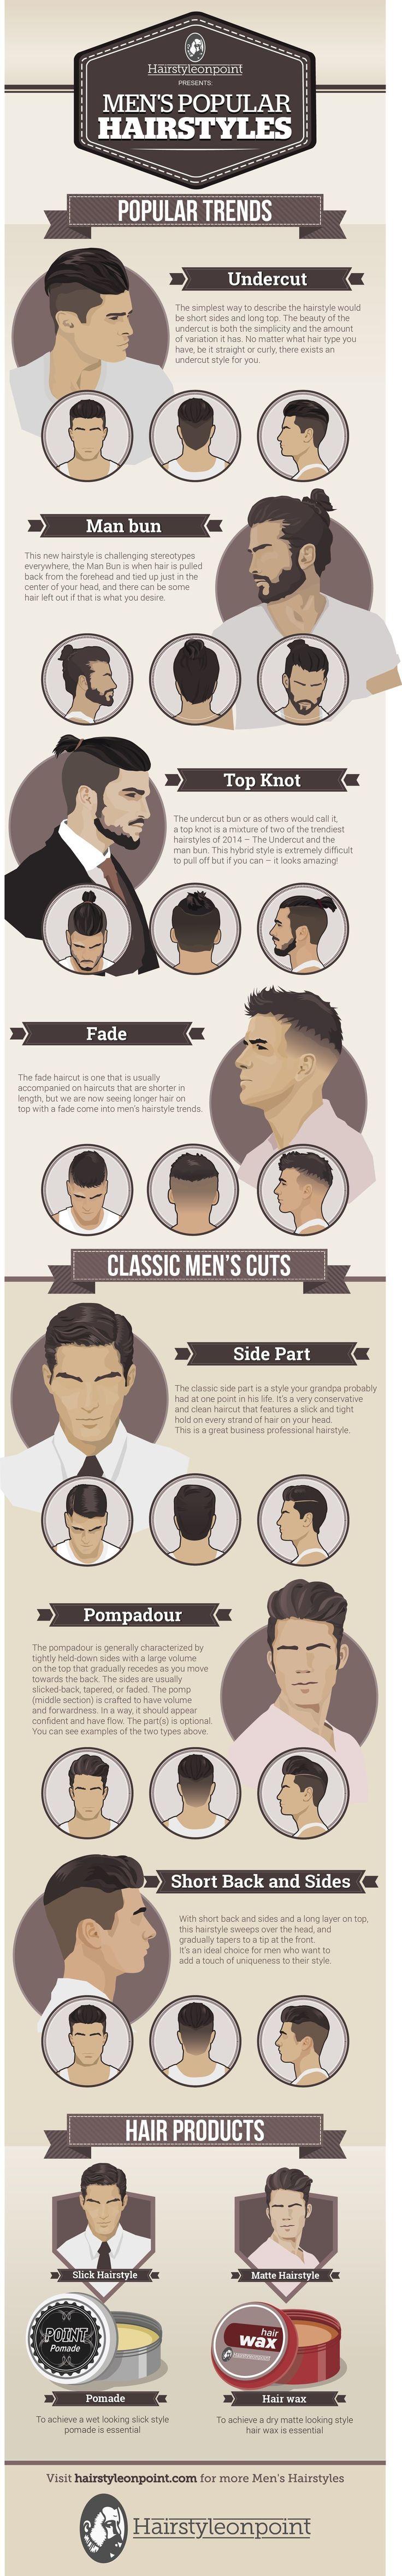 Mens gromming Mens hairstyles. Men fashion